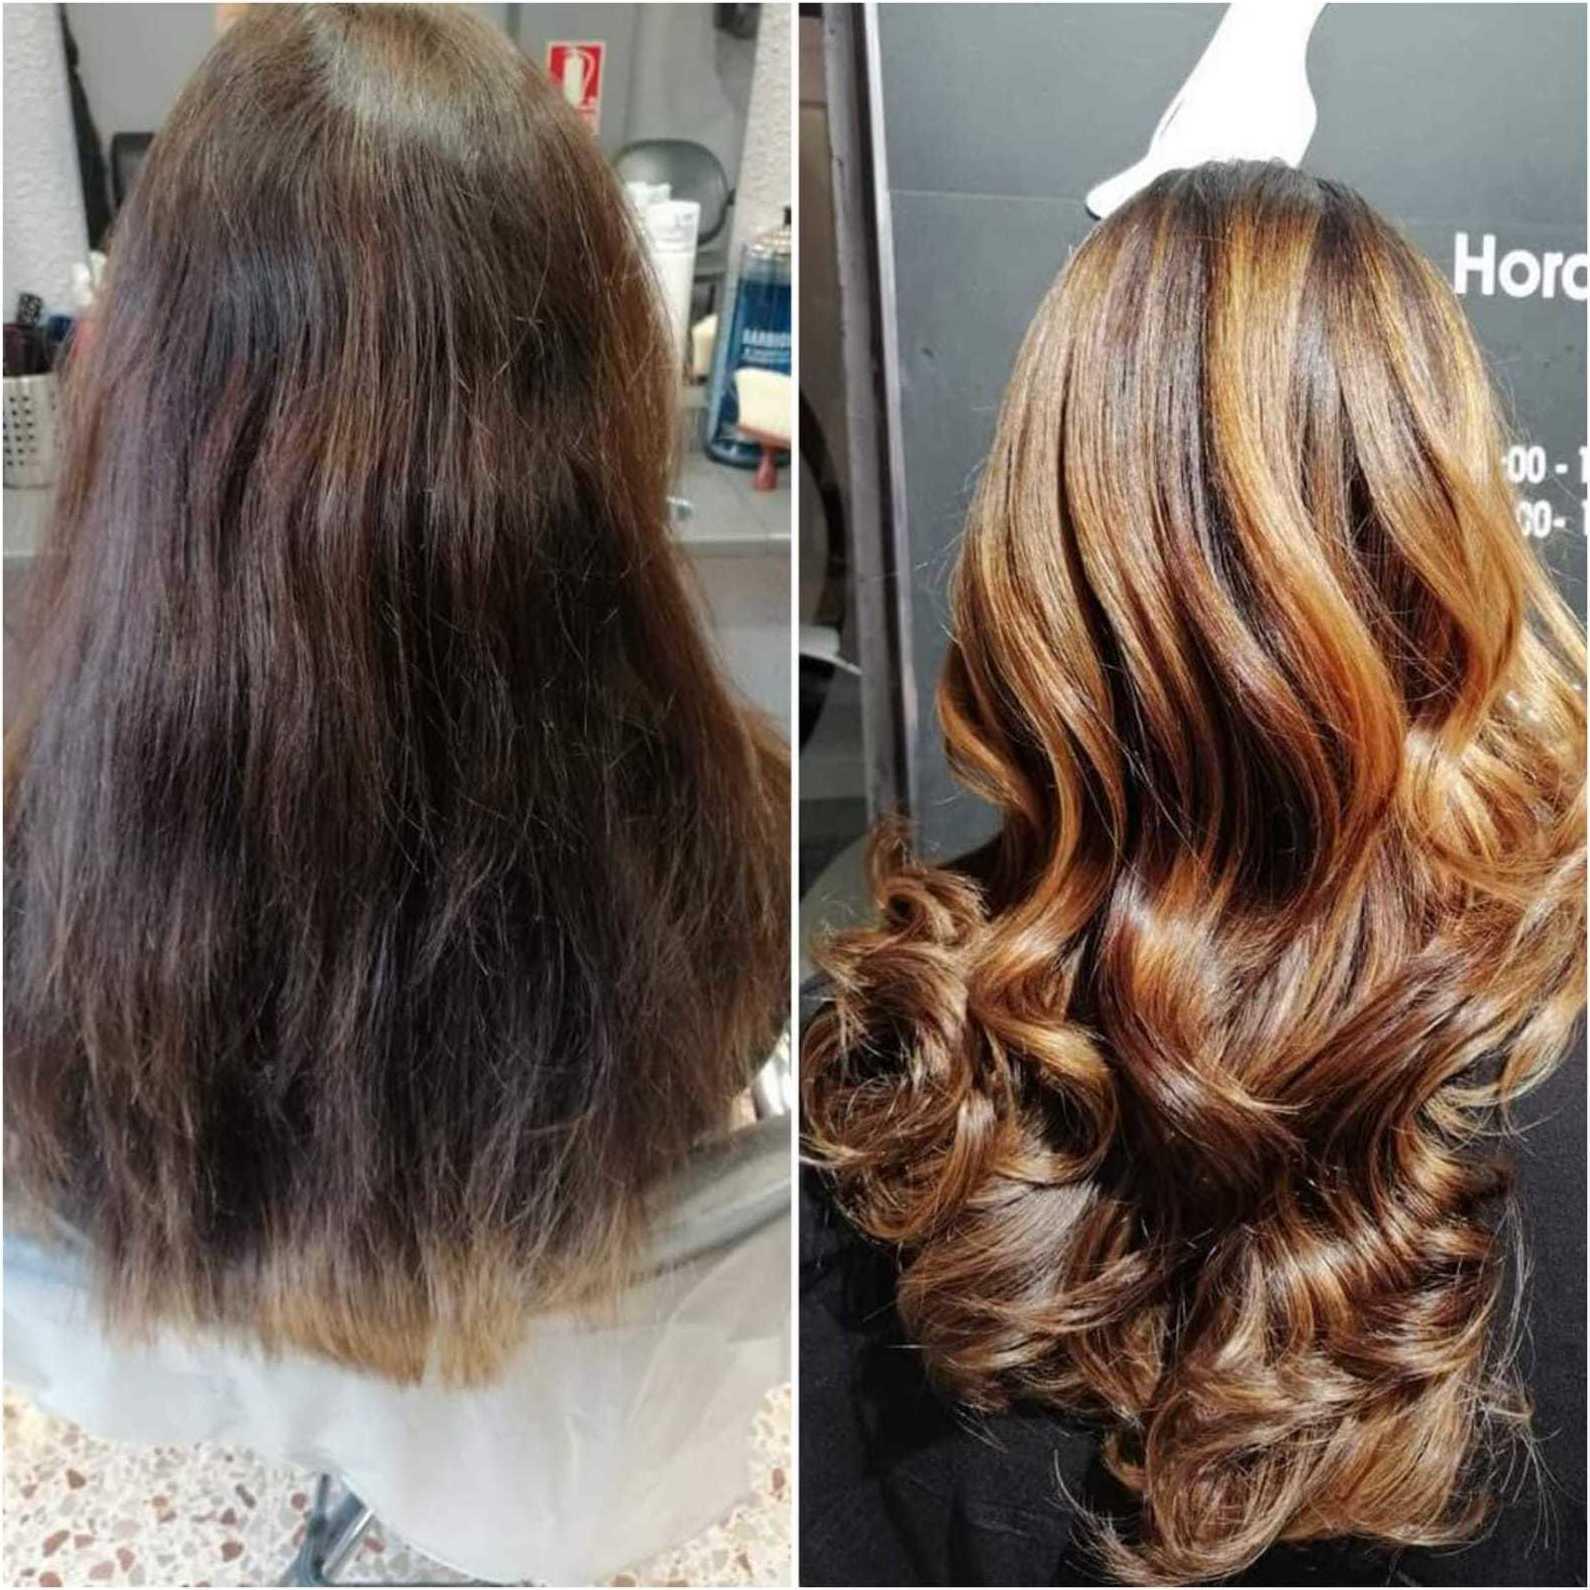 Foto 25 de Peluquería y maquillaje en  | Lucian Hair&Beauty